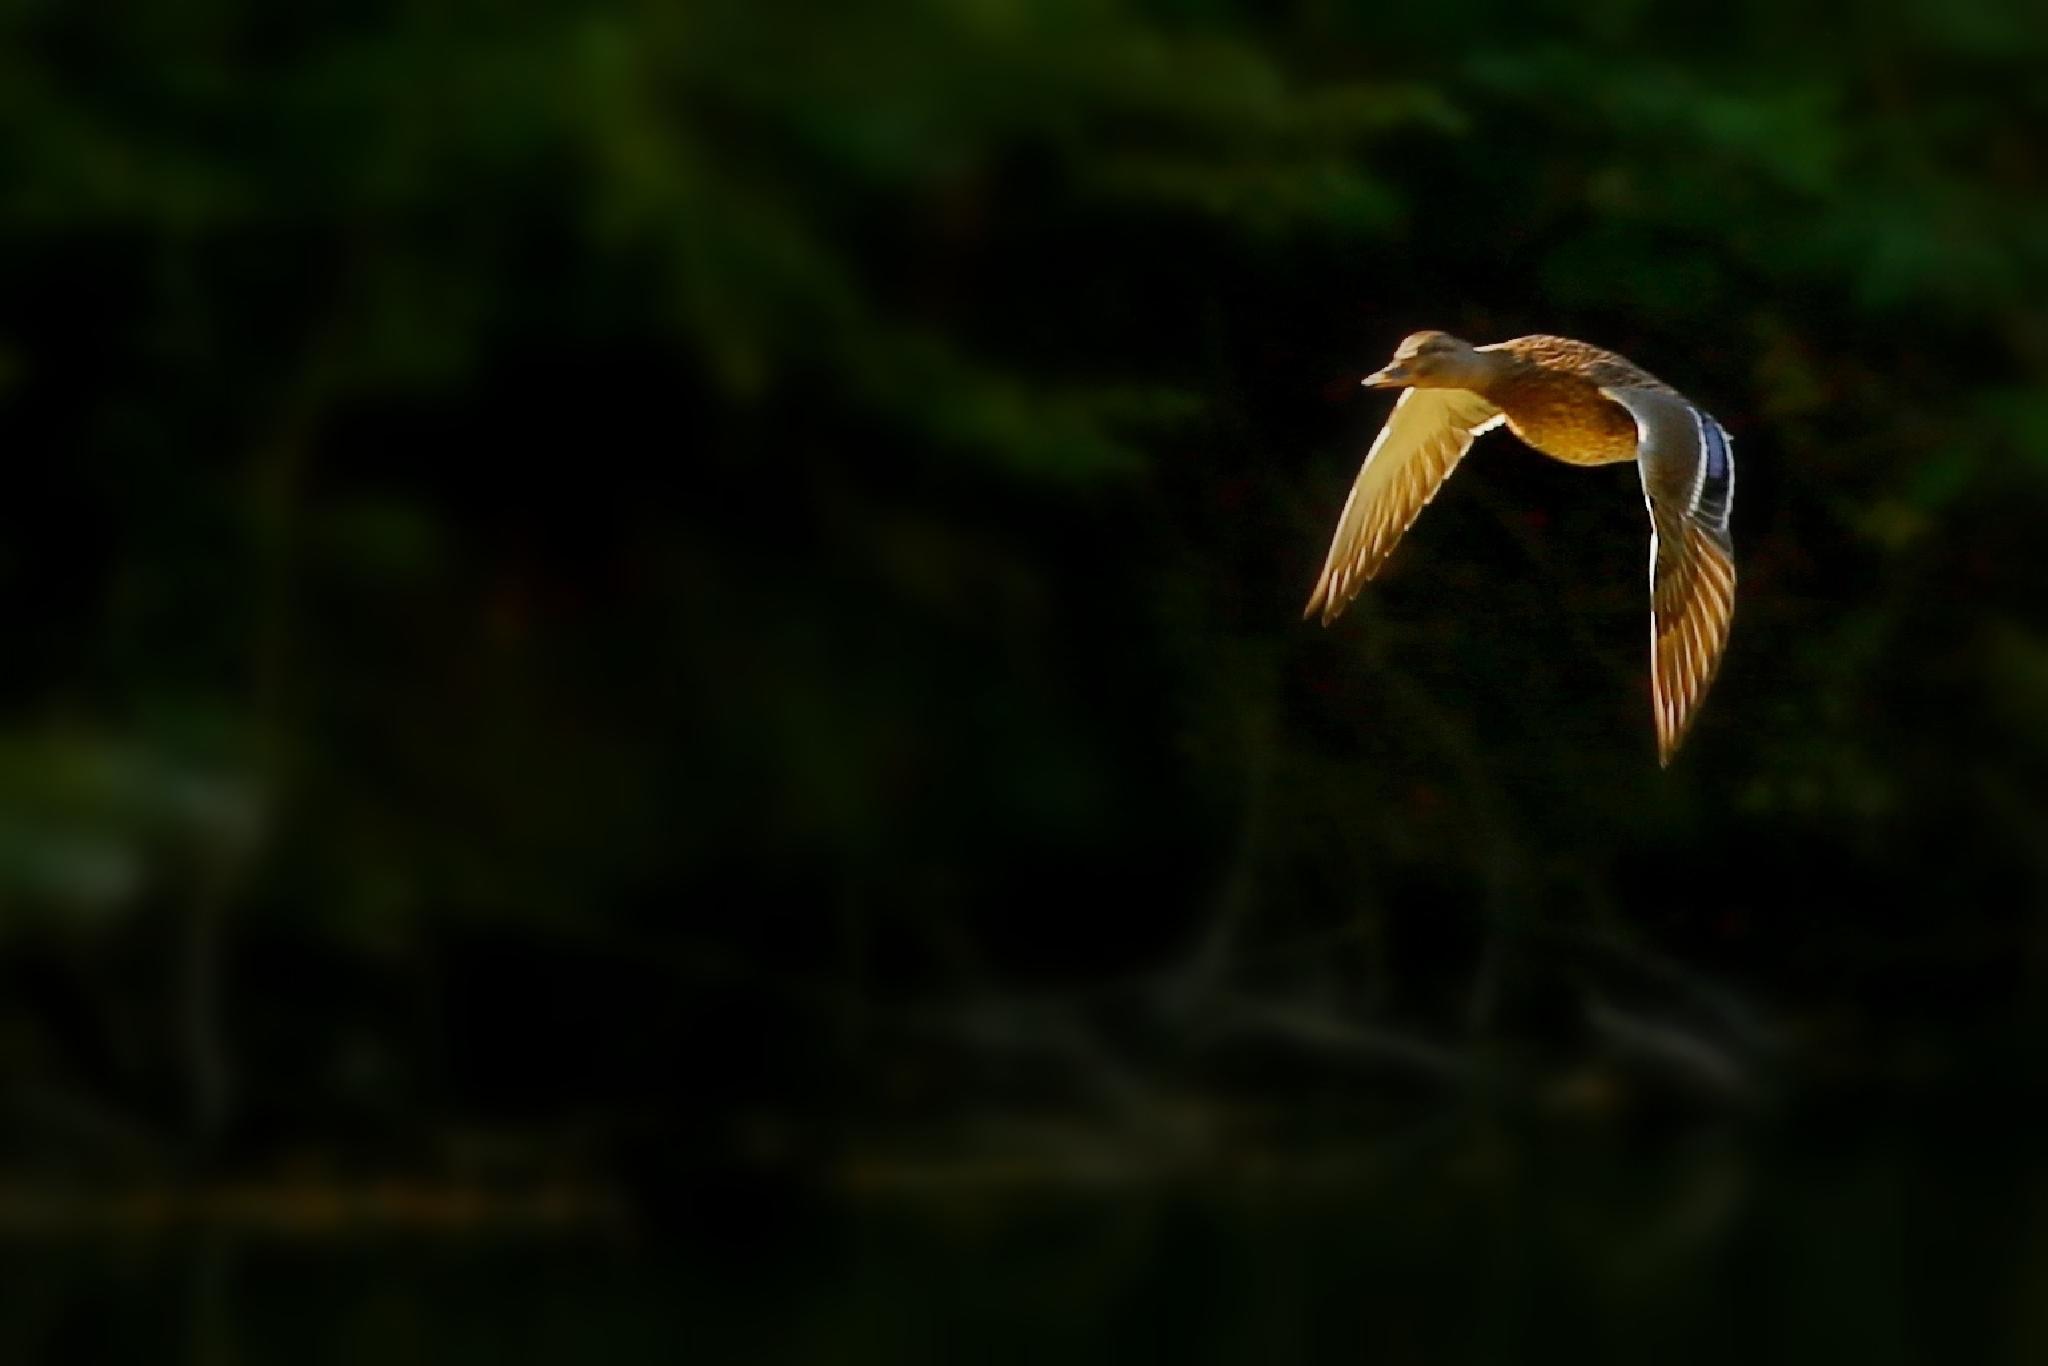 rackofly by tatjanamijatovi